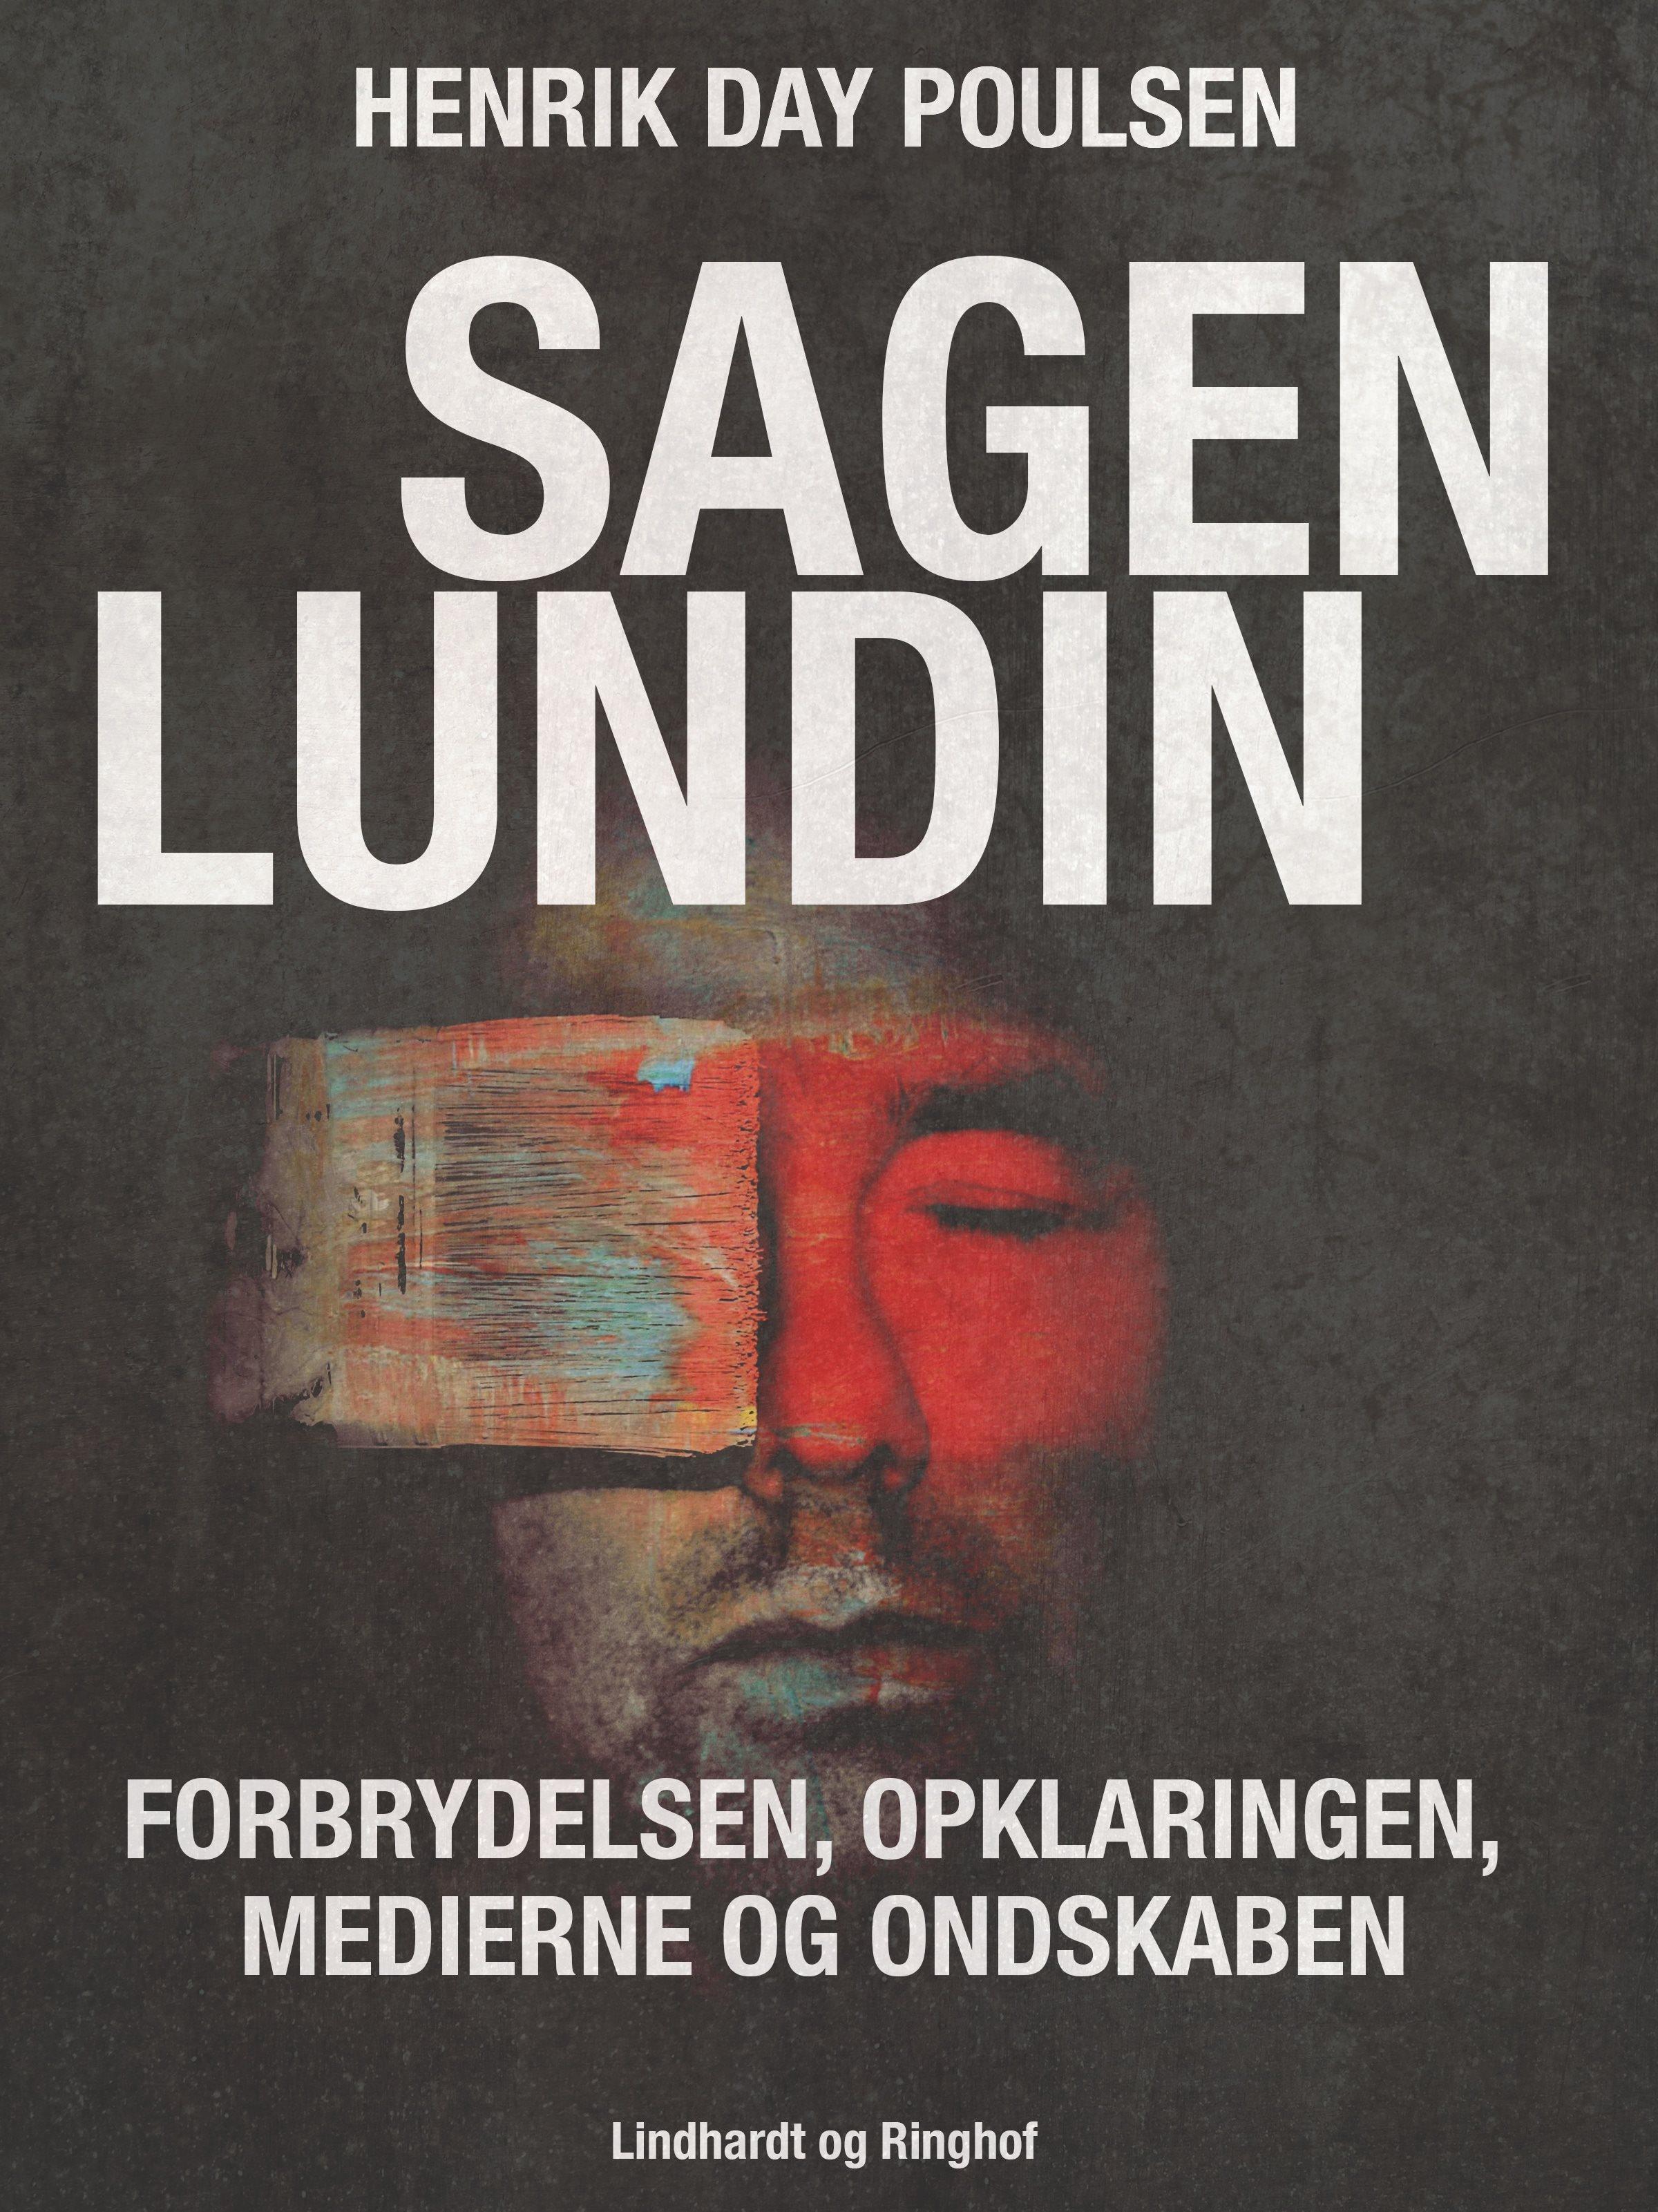 Sagen Lundin, Palle Bruus Jensen, Henrik Day Poulsen, krimi, kriminalsag, true crime, efterforskning, Peter Lundin